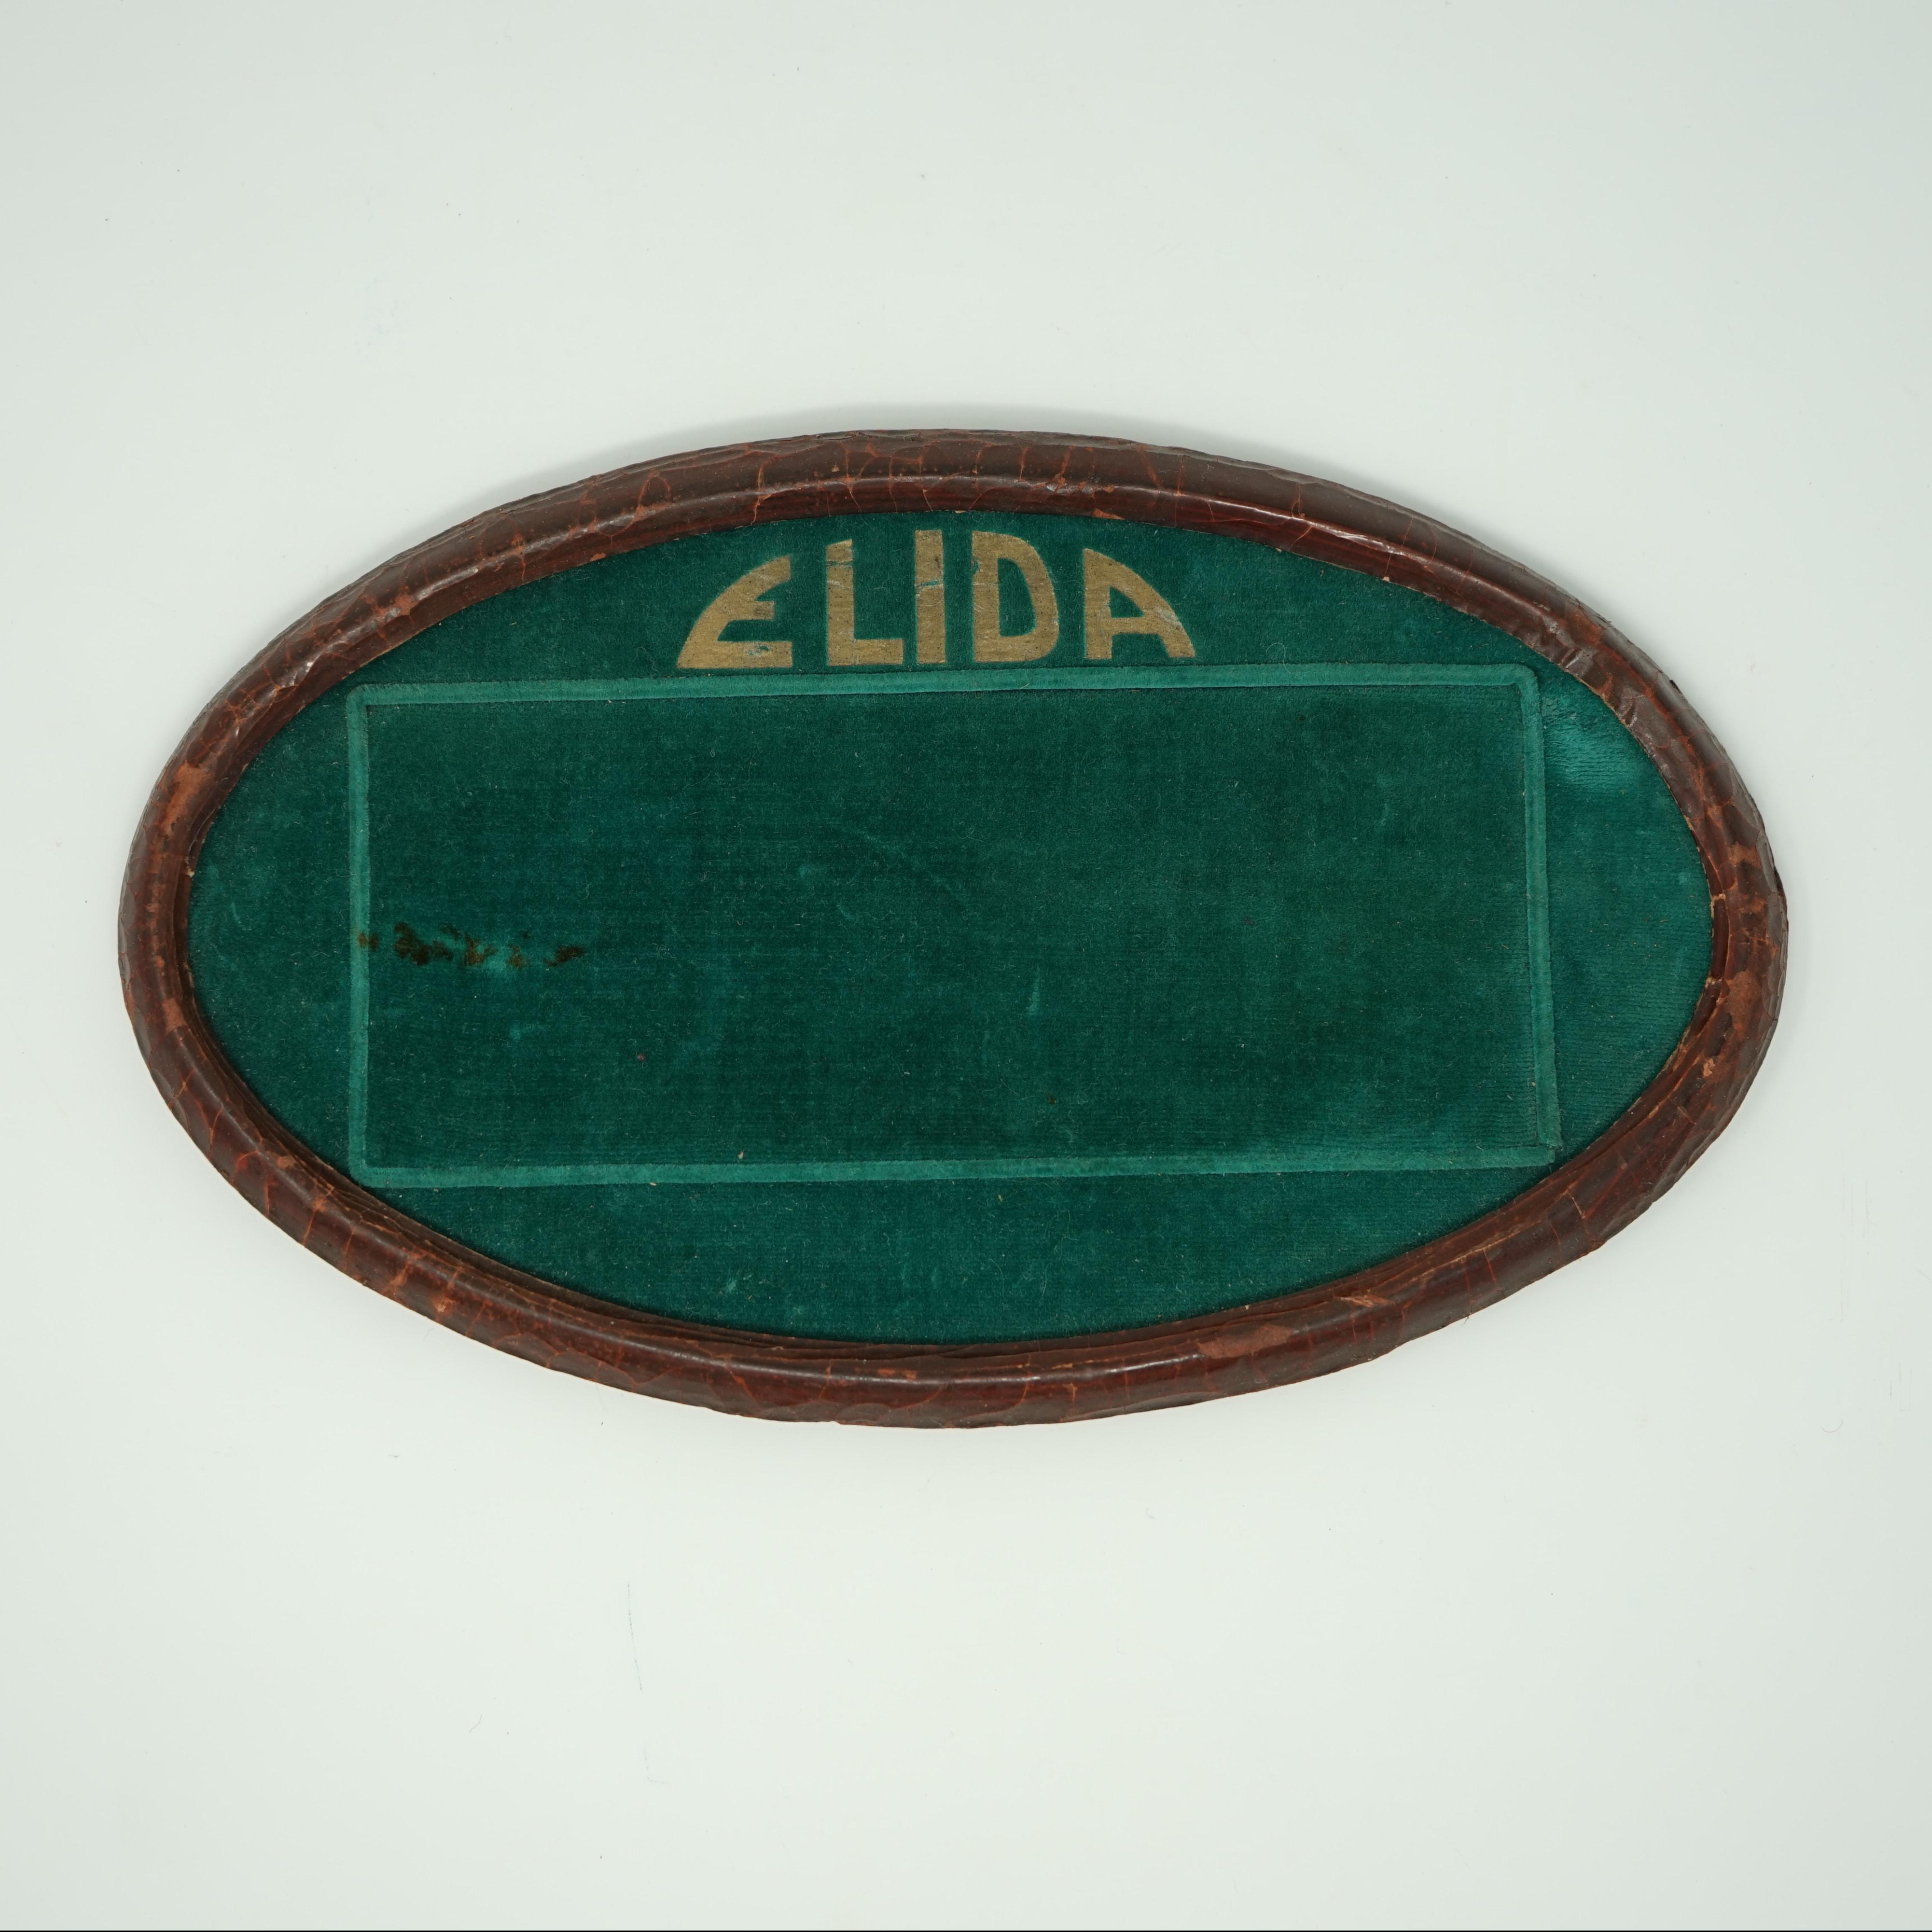 Ancien Présentoir de Montres Elida